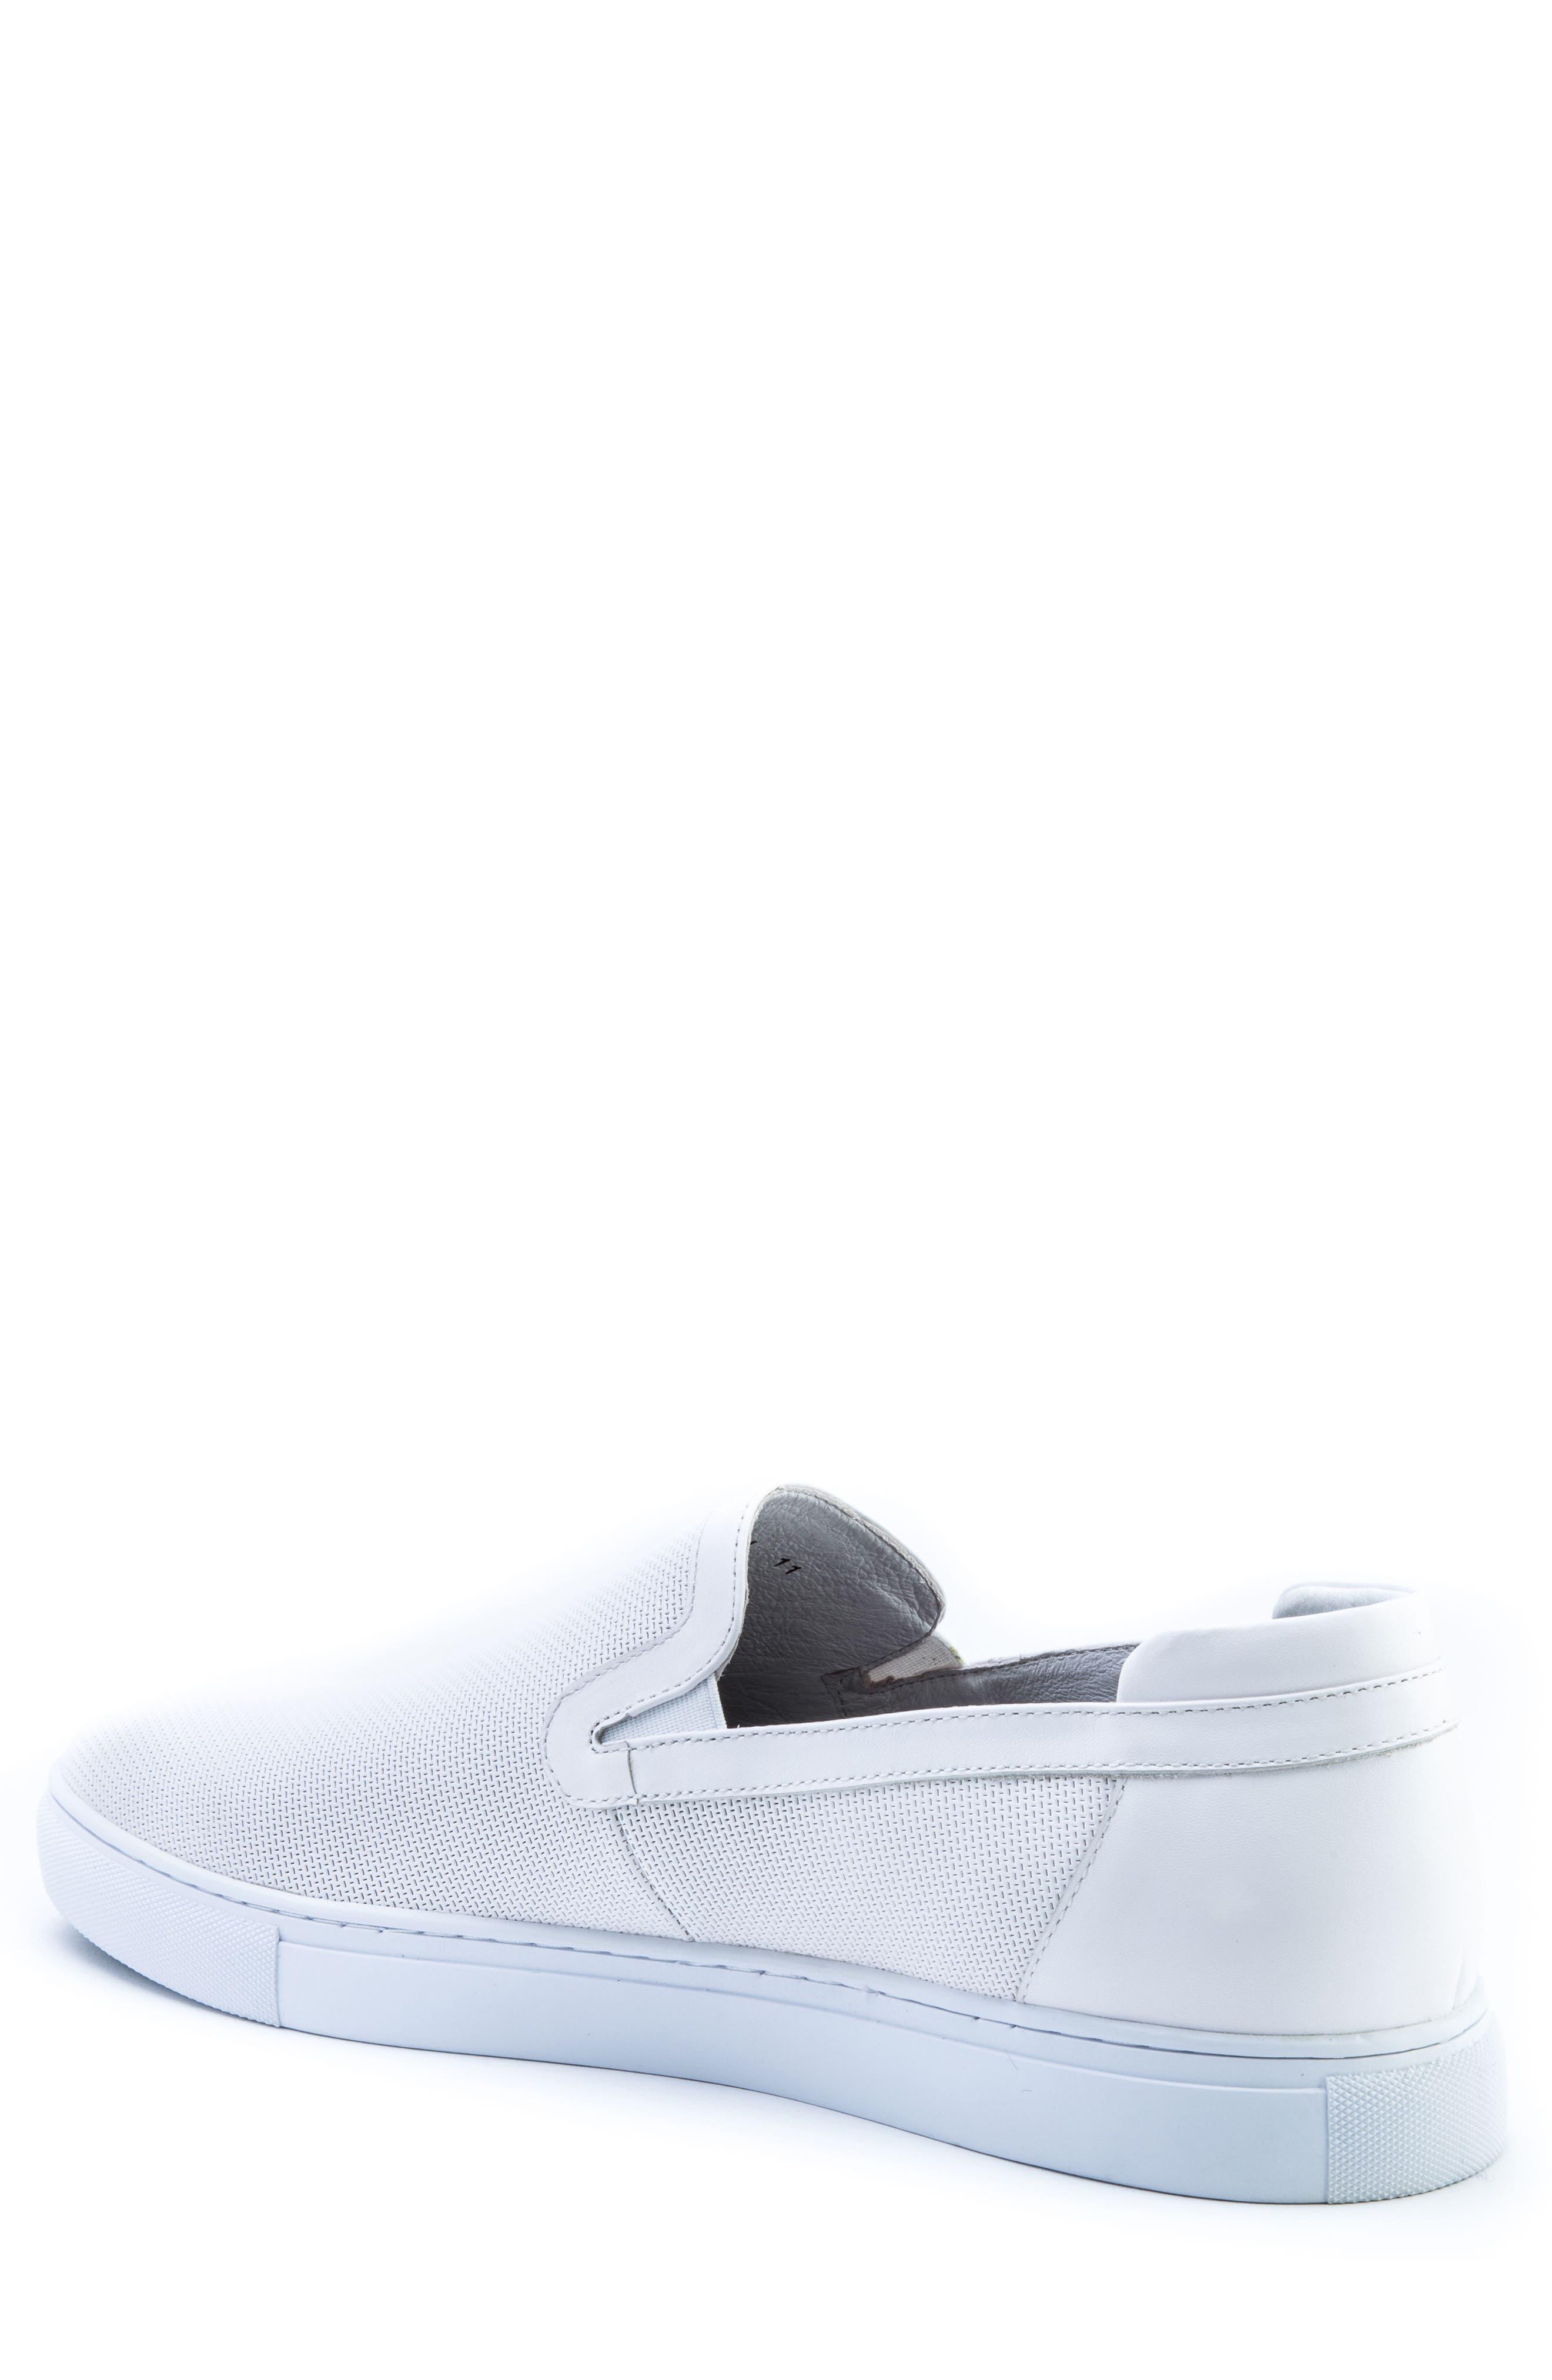 Grant Sneaker,                             Alternate thumbnail 2, color,                             White Leather